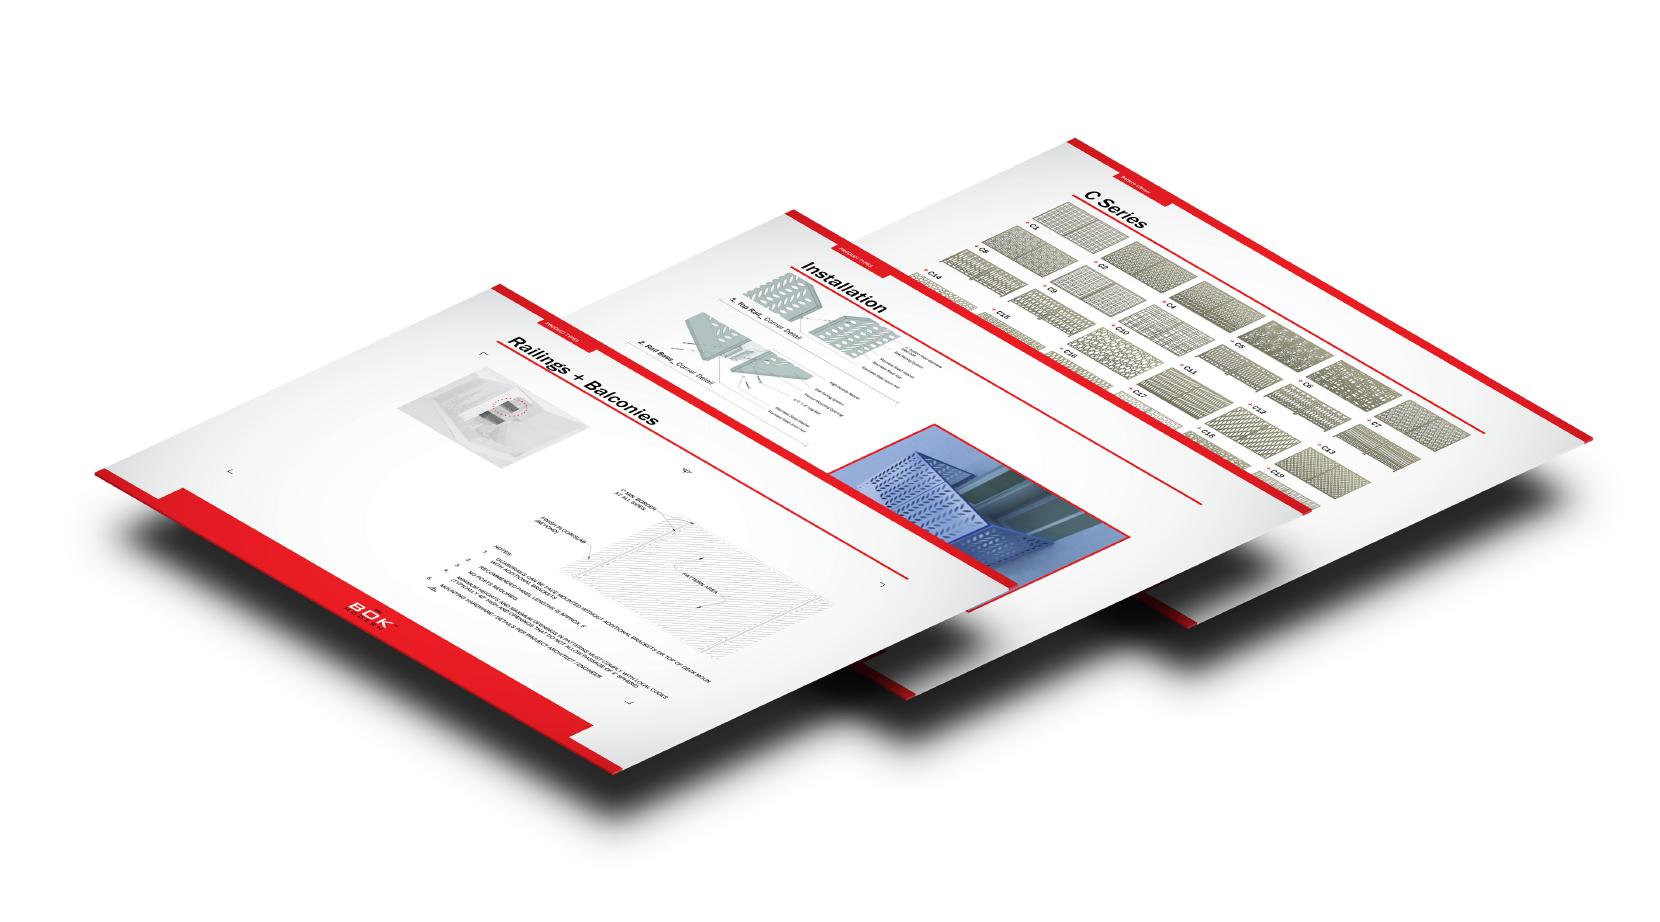 Tablet-Screens-presentation-Mock-up 2.jpg